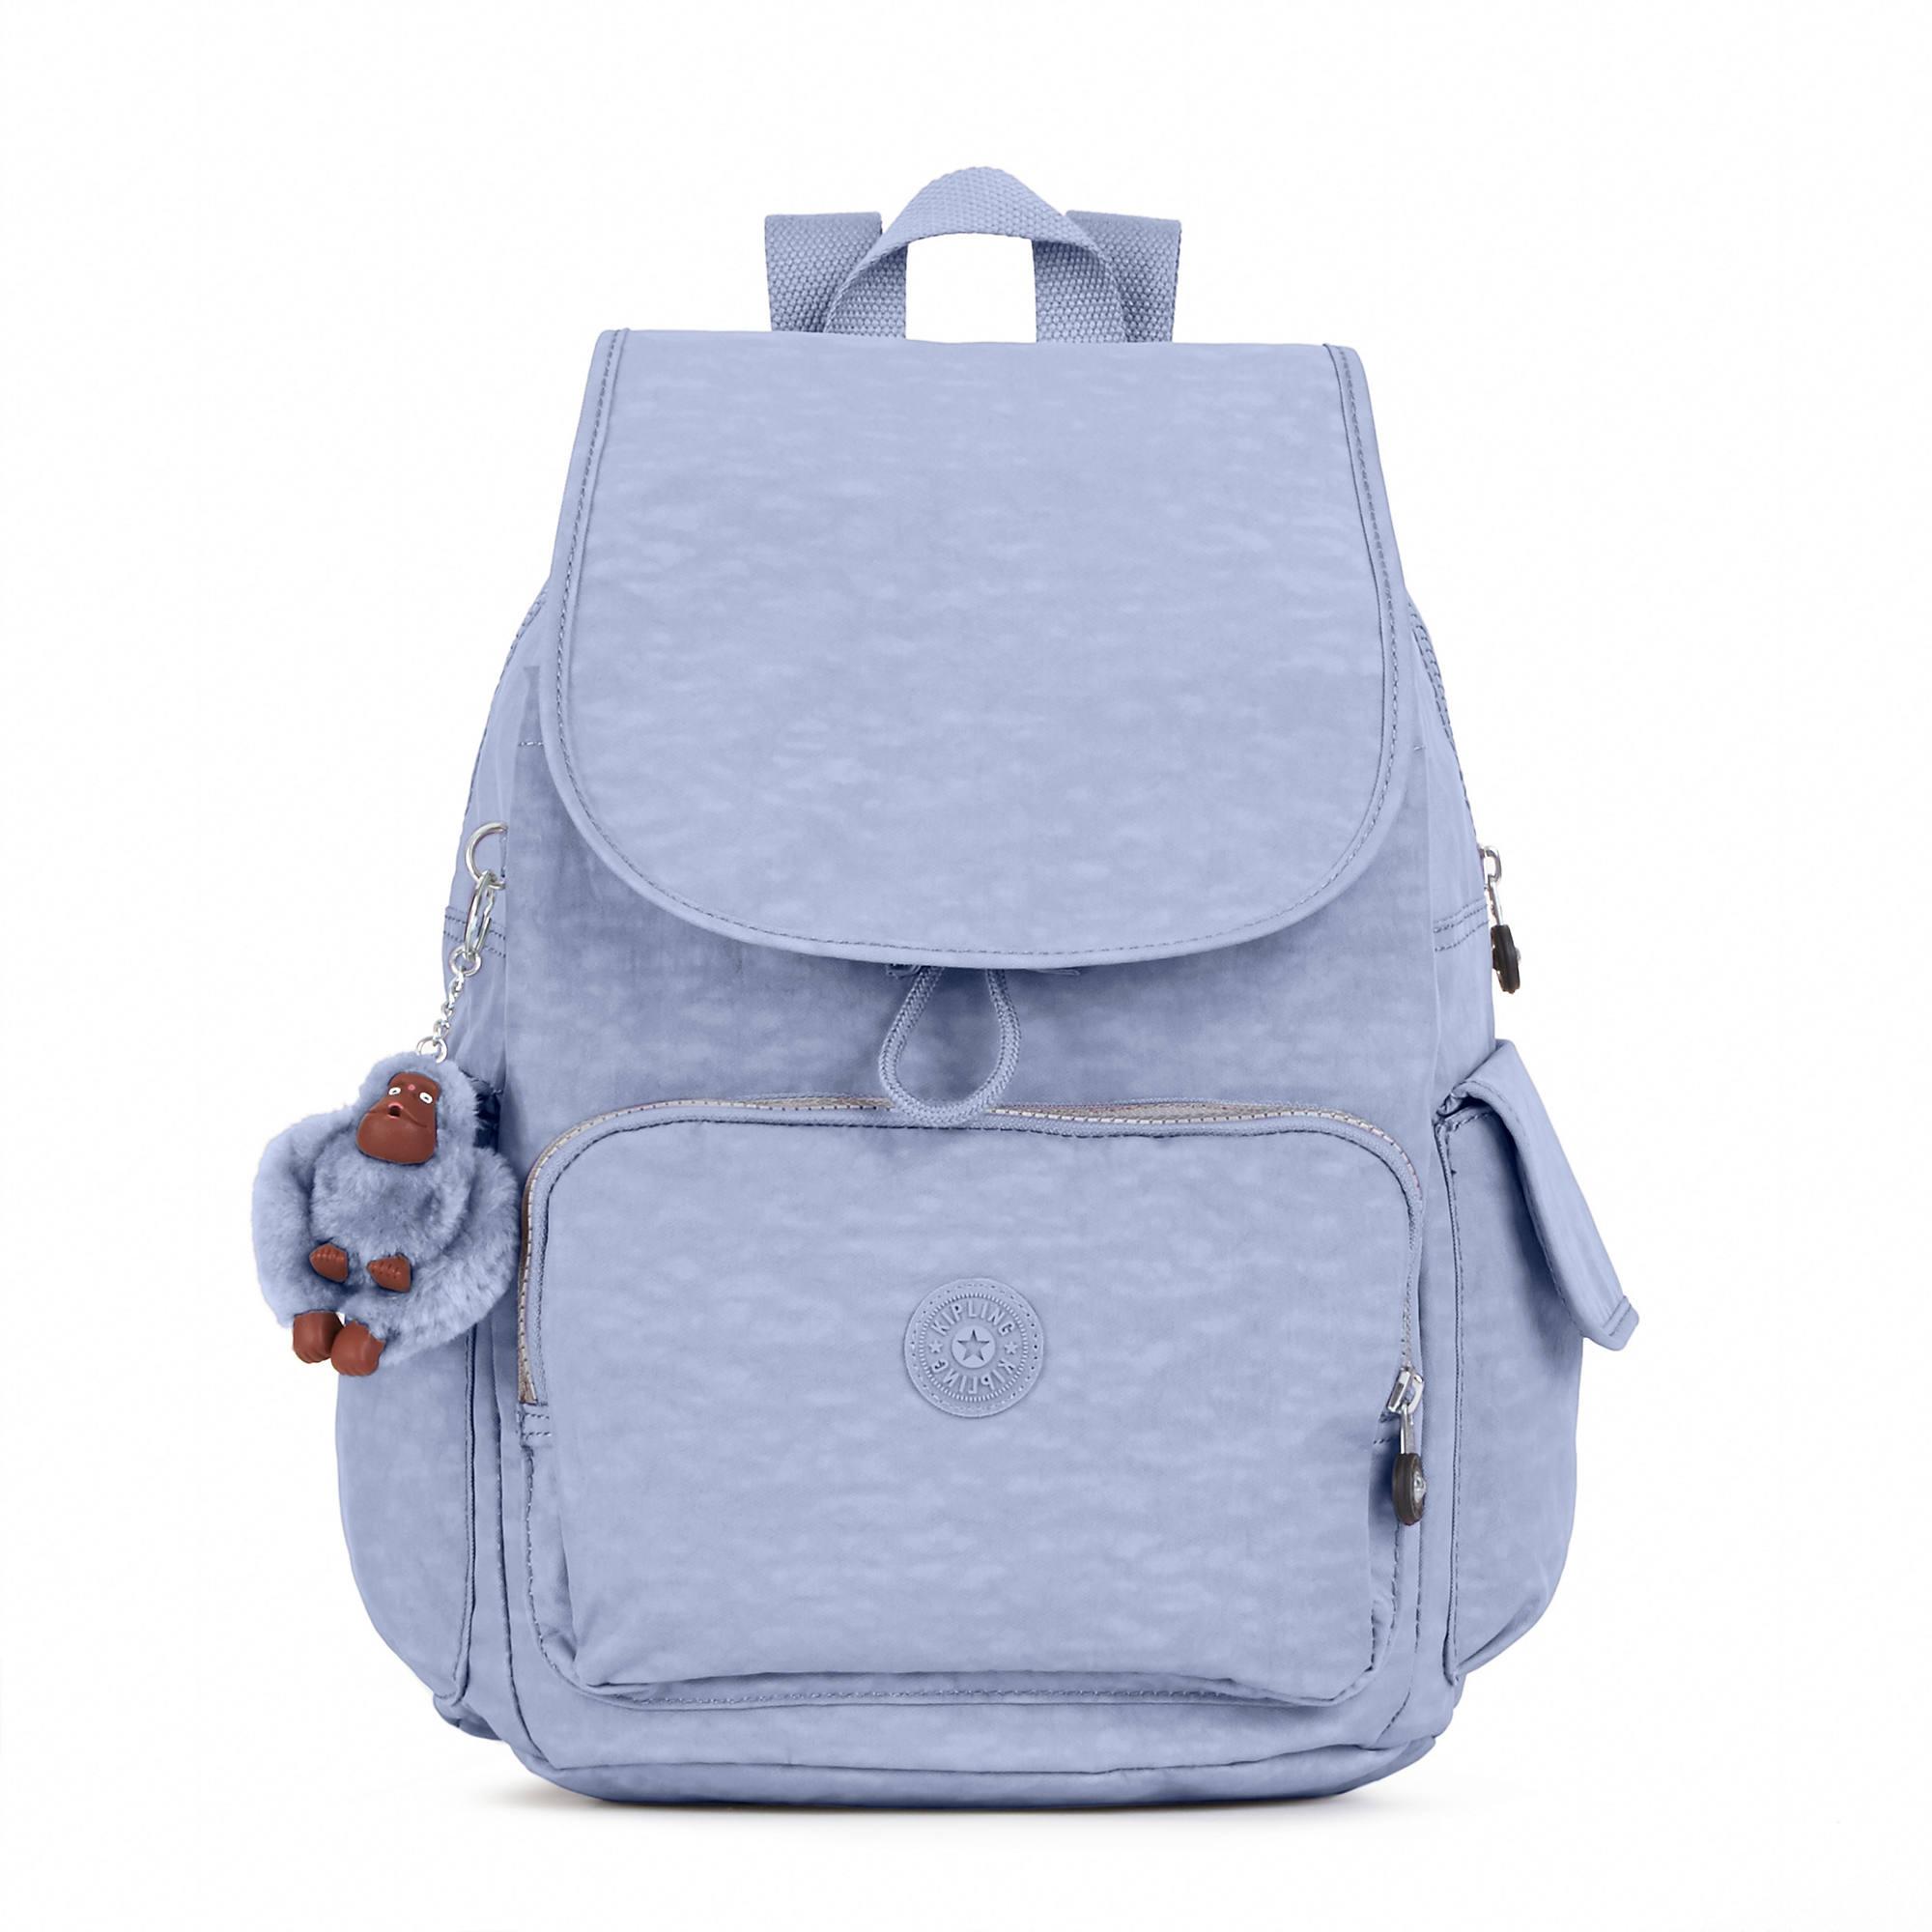 Ravier Medium Backpack,Belgian Blue,large 8a223be3fb